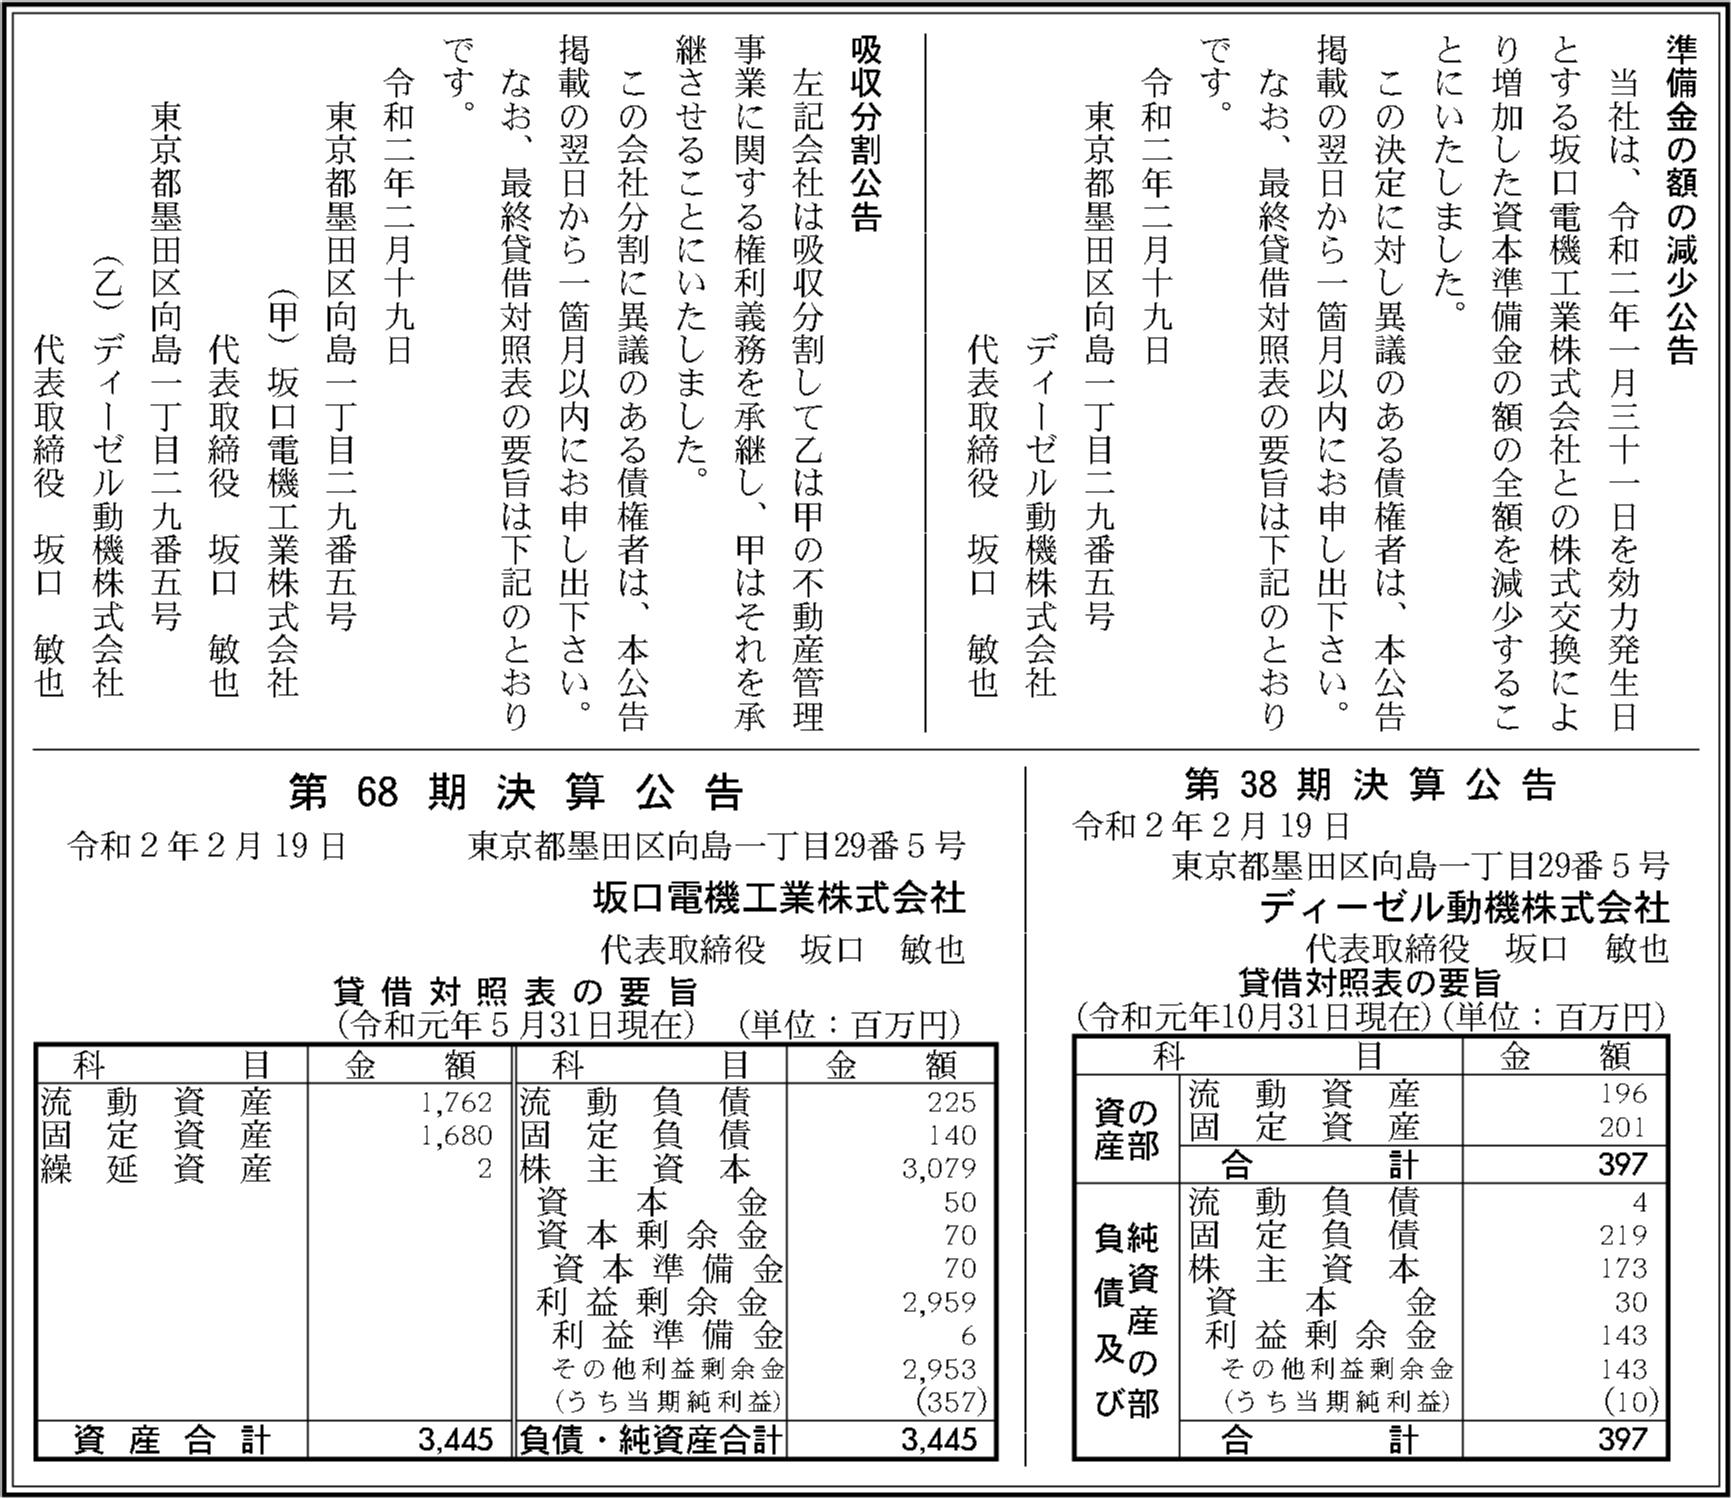 0093 a424a12f2350caeddad573de39fbb4e275c72a192e32fb5f3bff4f46fc818618d1cb47af38795ed9649540059efb71a739b724367b4eae6040f17ca28a7242e6 03